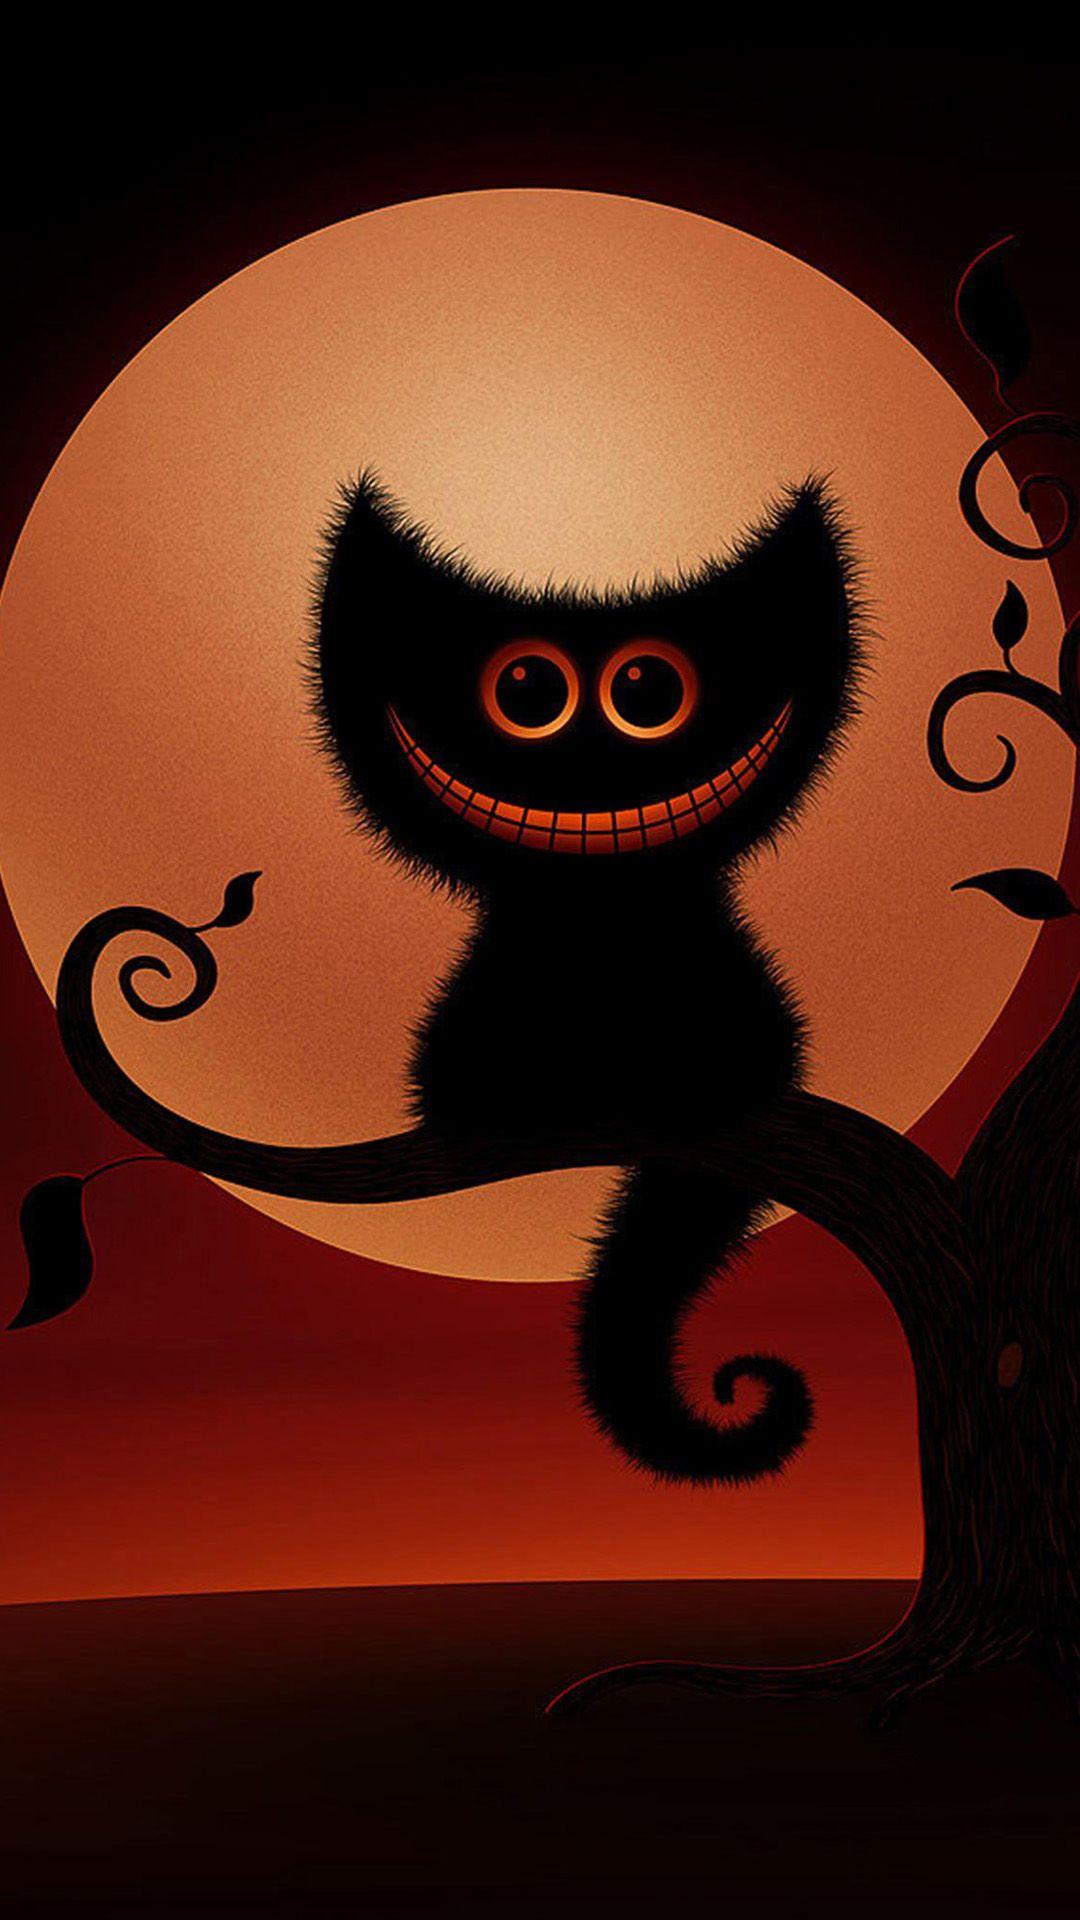 iphone 6 halloween backgrounds